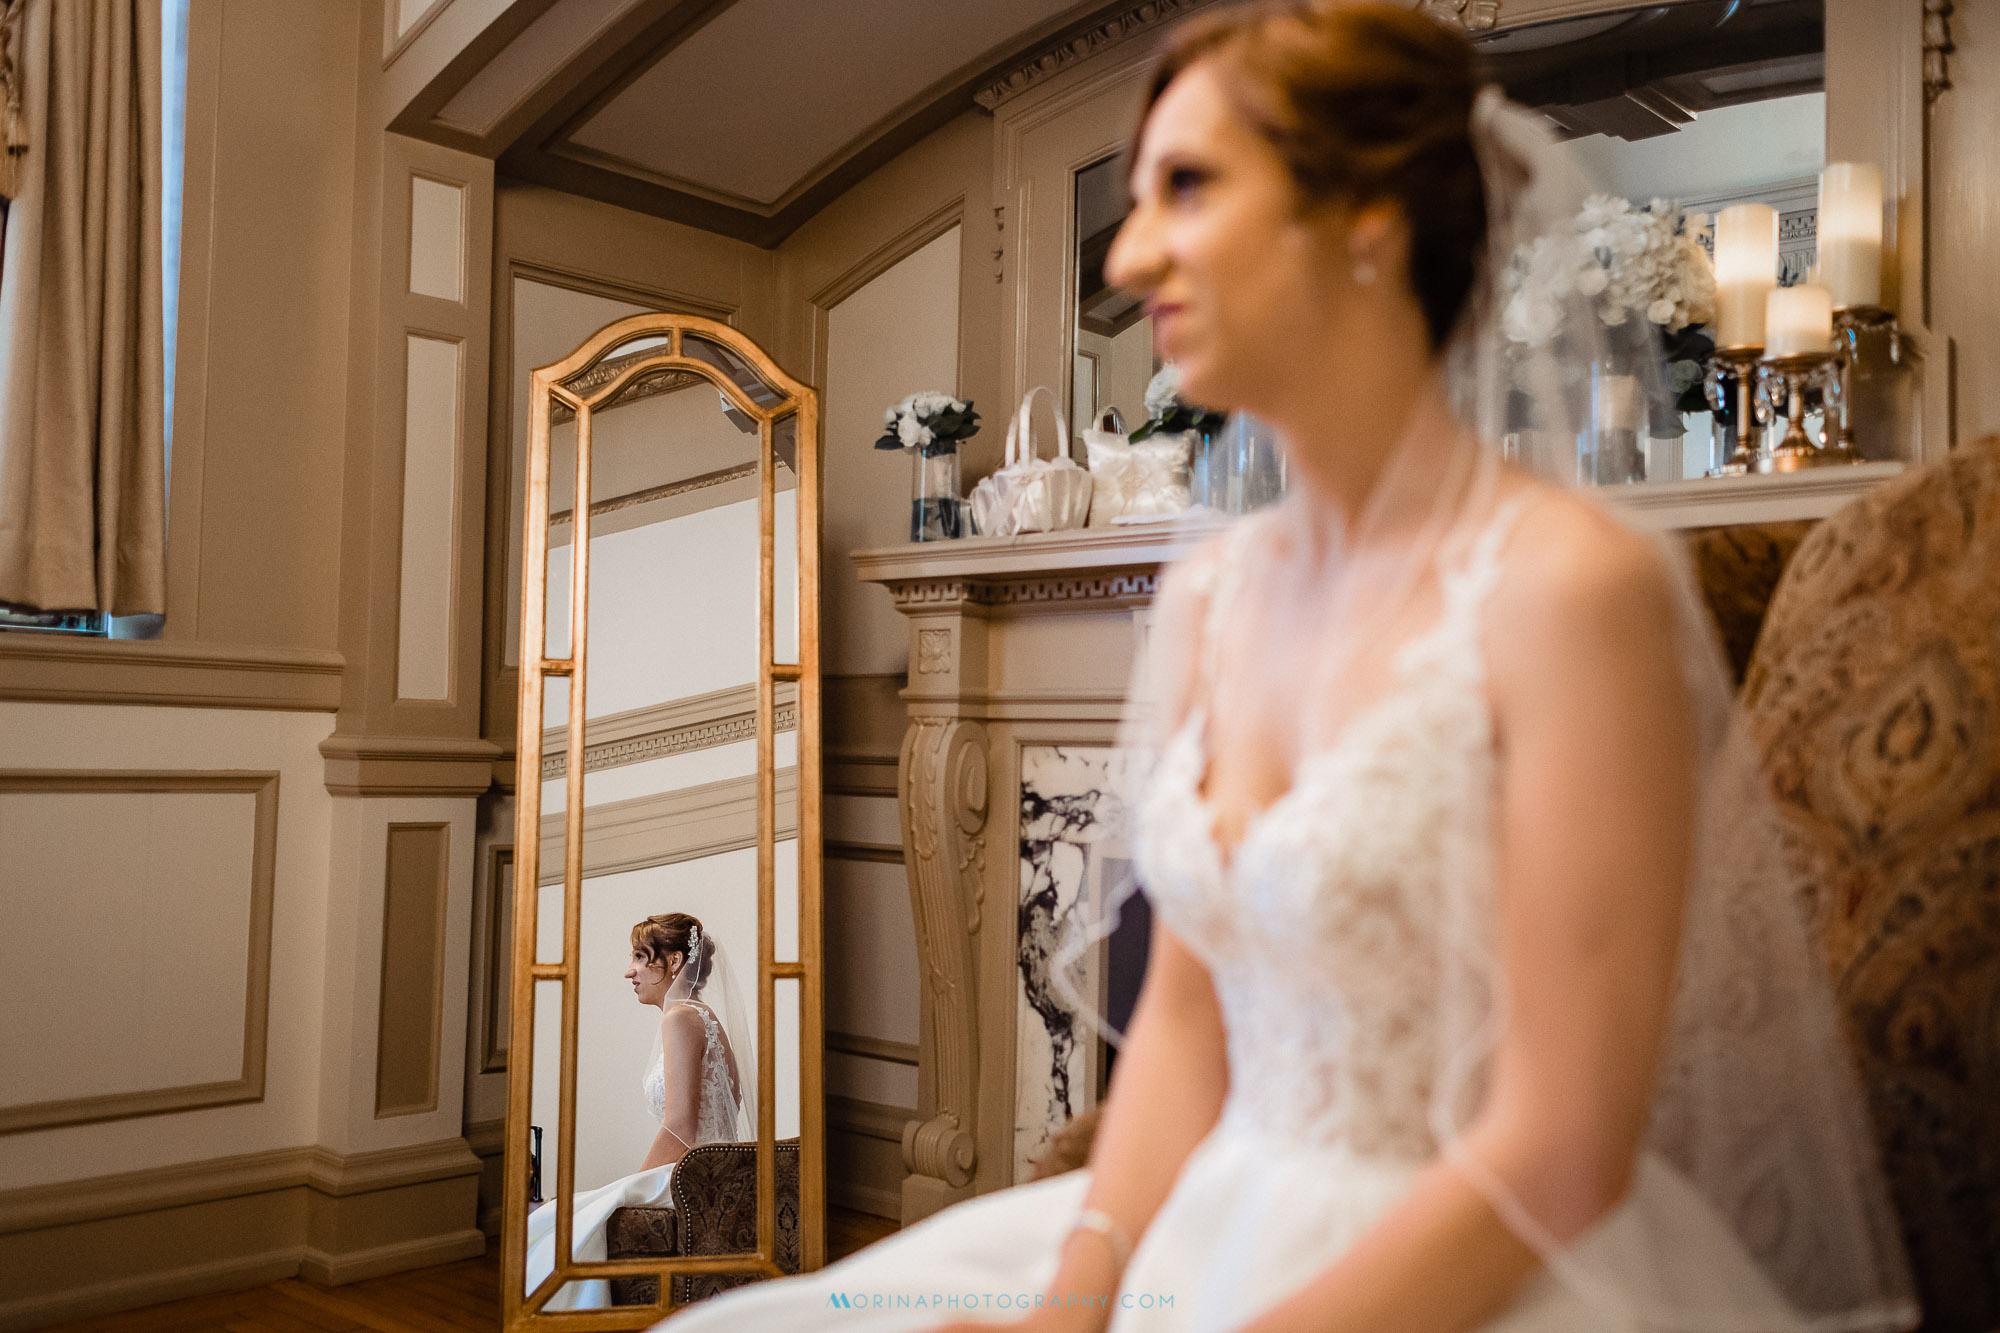 Ilhana & Jonathan Wedding at Vault 634 - Allentown 0020.jpg